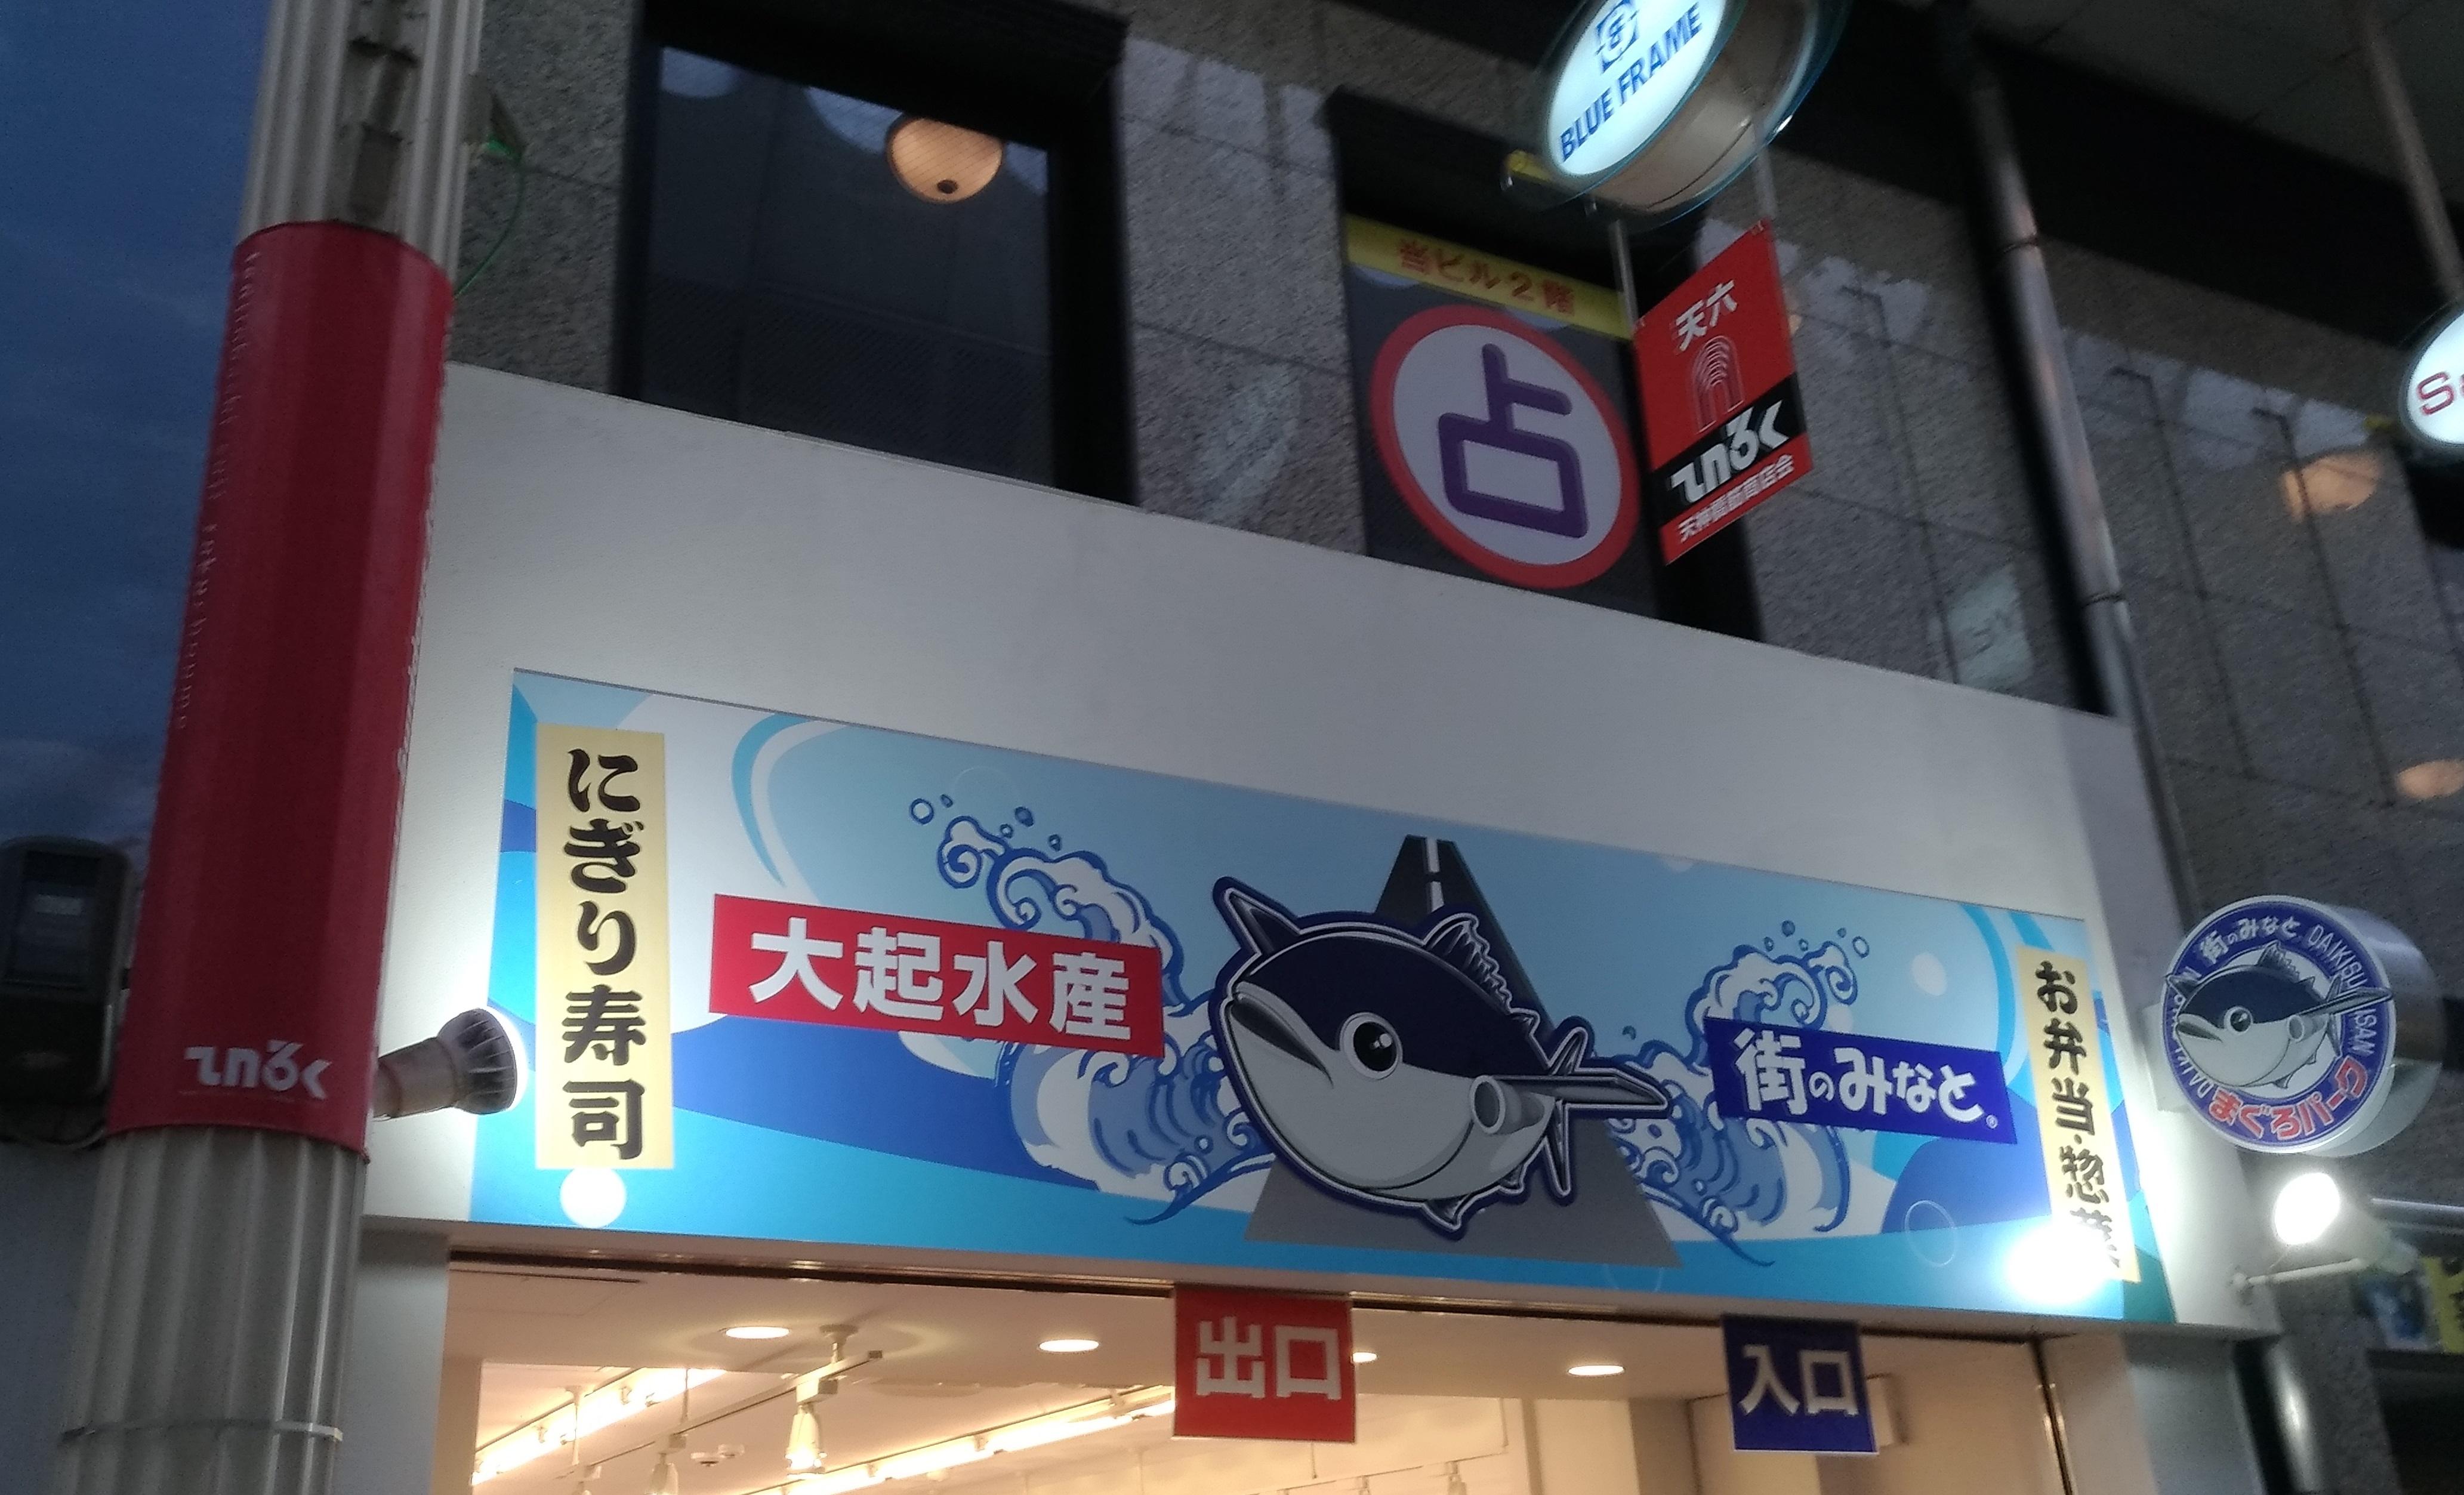 tenma_osaka_sushi_0725_2.jpg